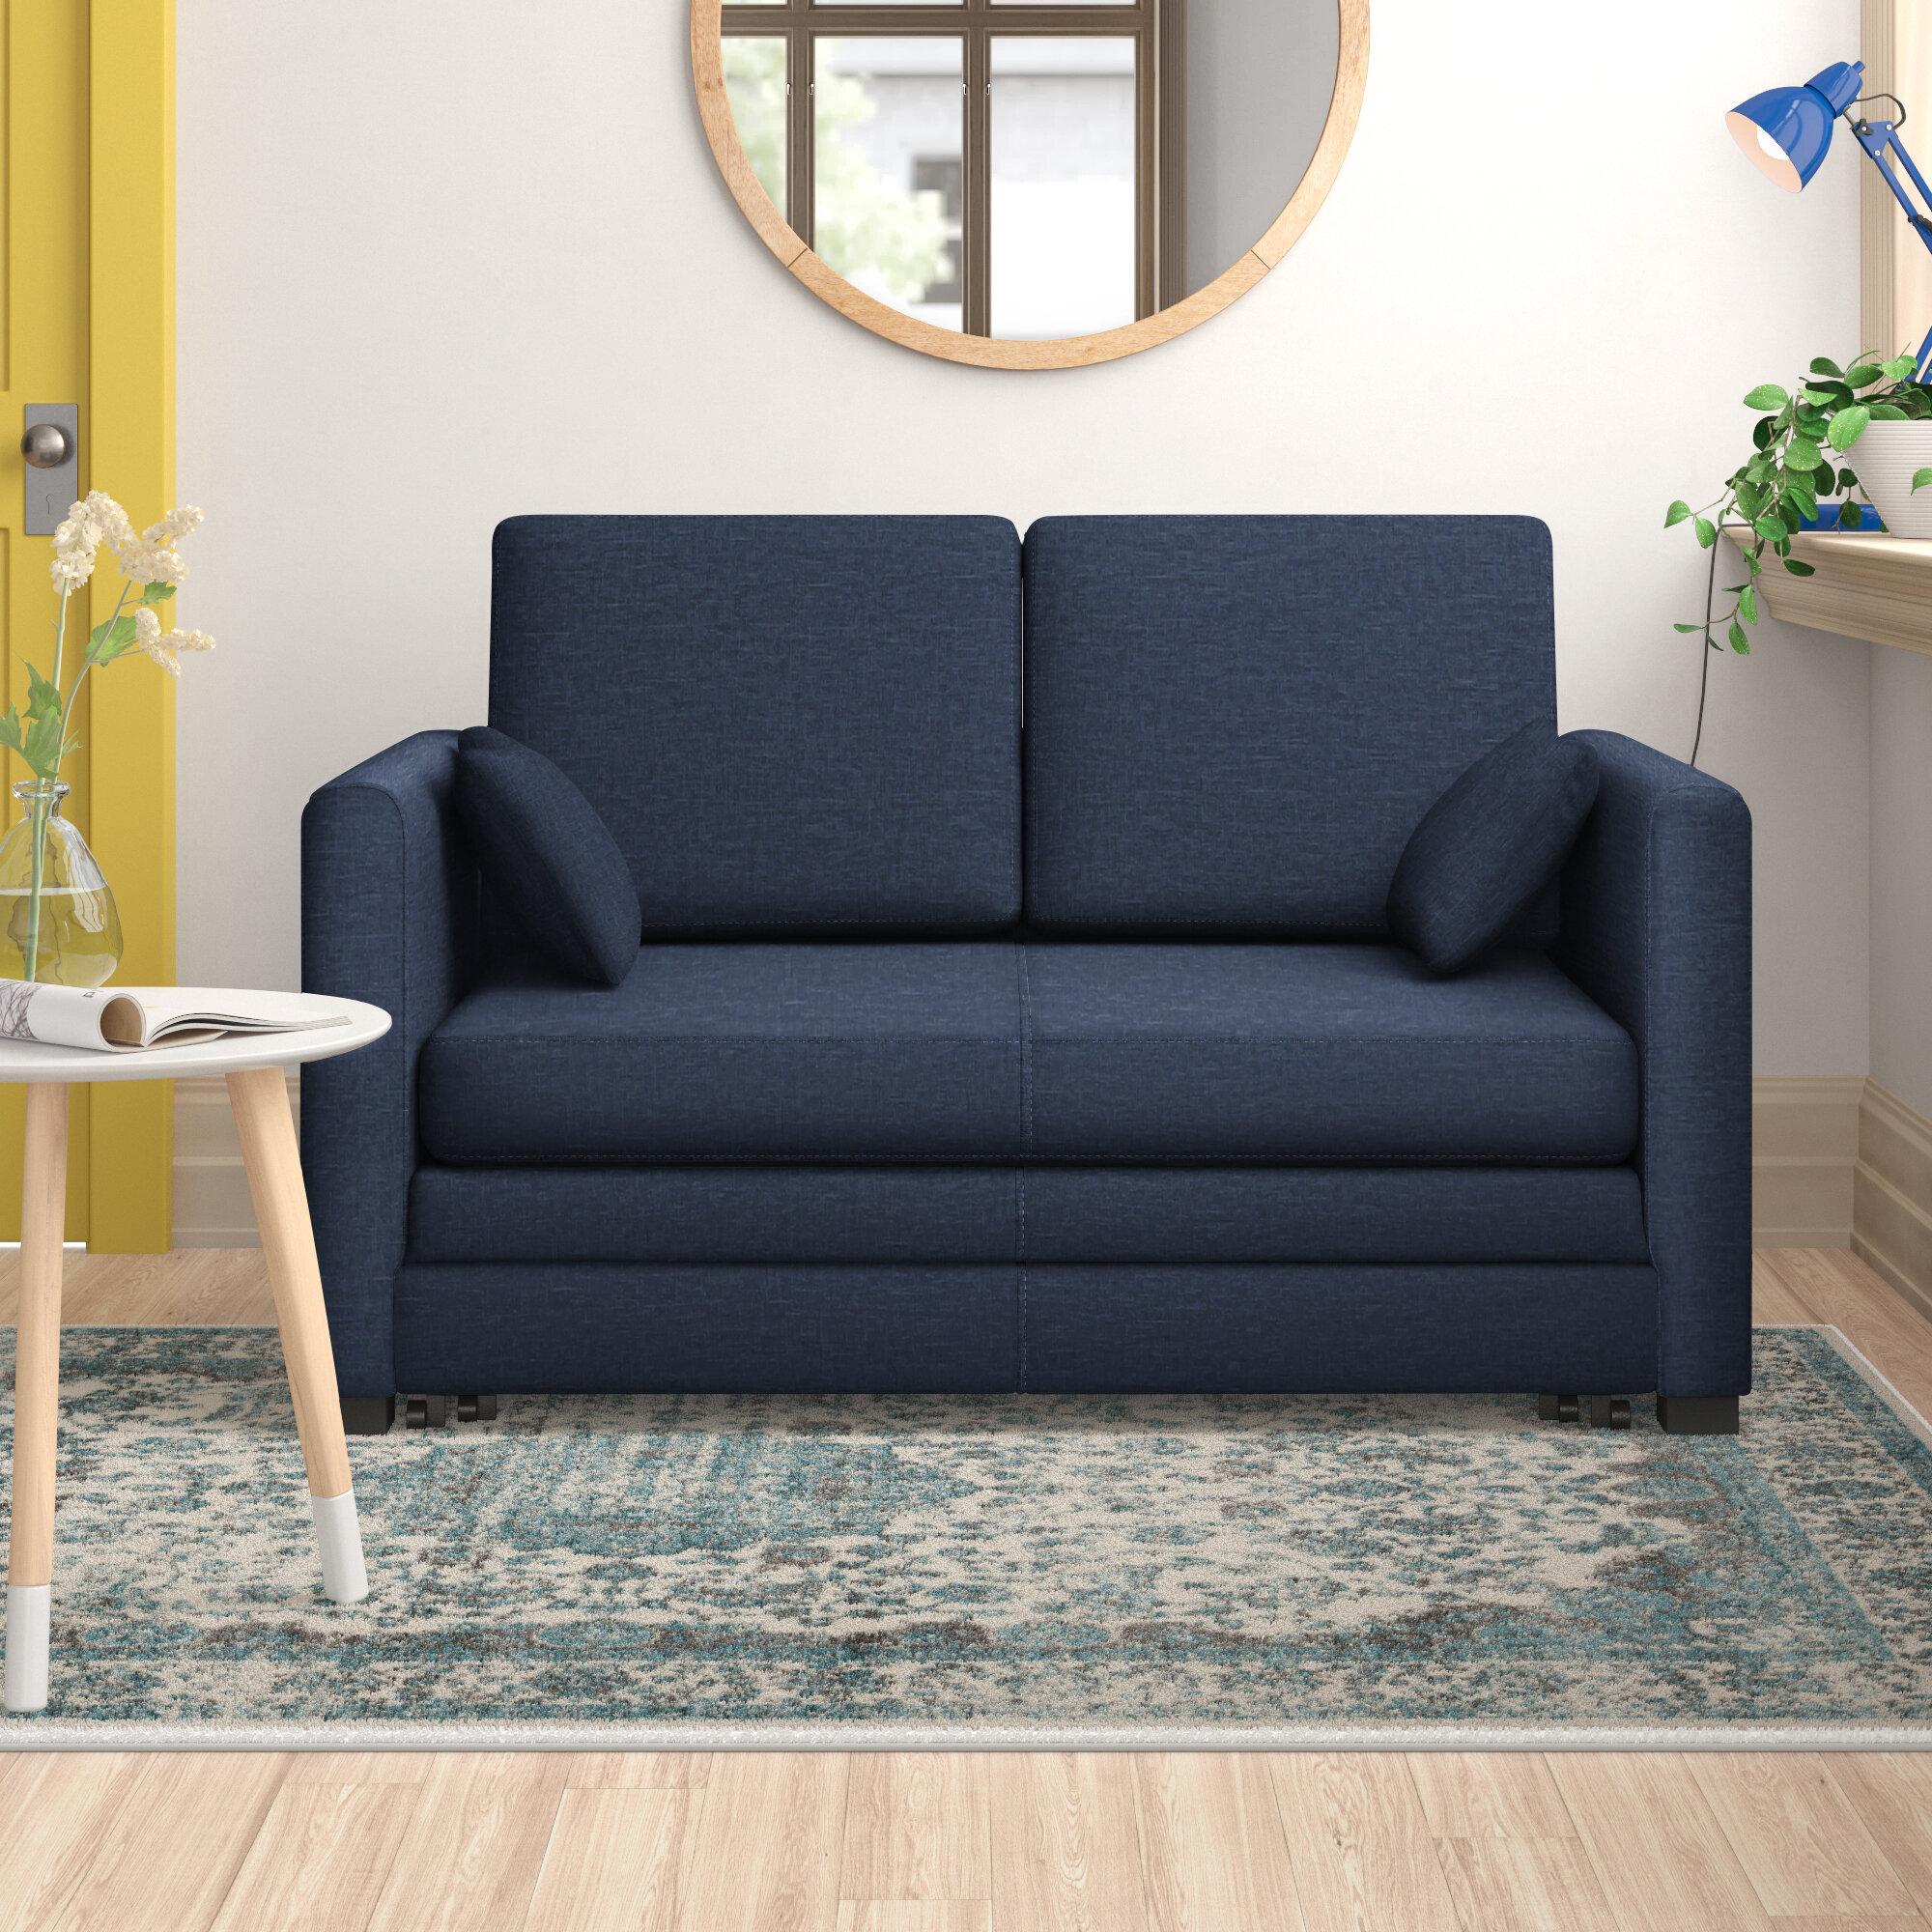 Zipcode Design Ash Hill 2 Seater Fold Out Sofa Bed Reviews Wayfair Co Uk